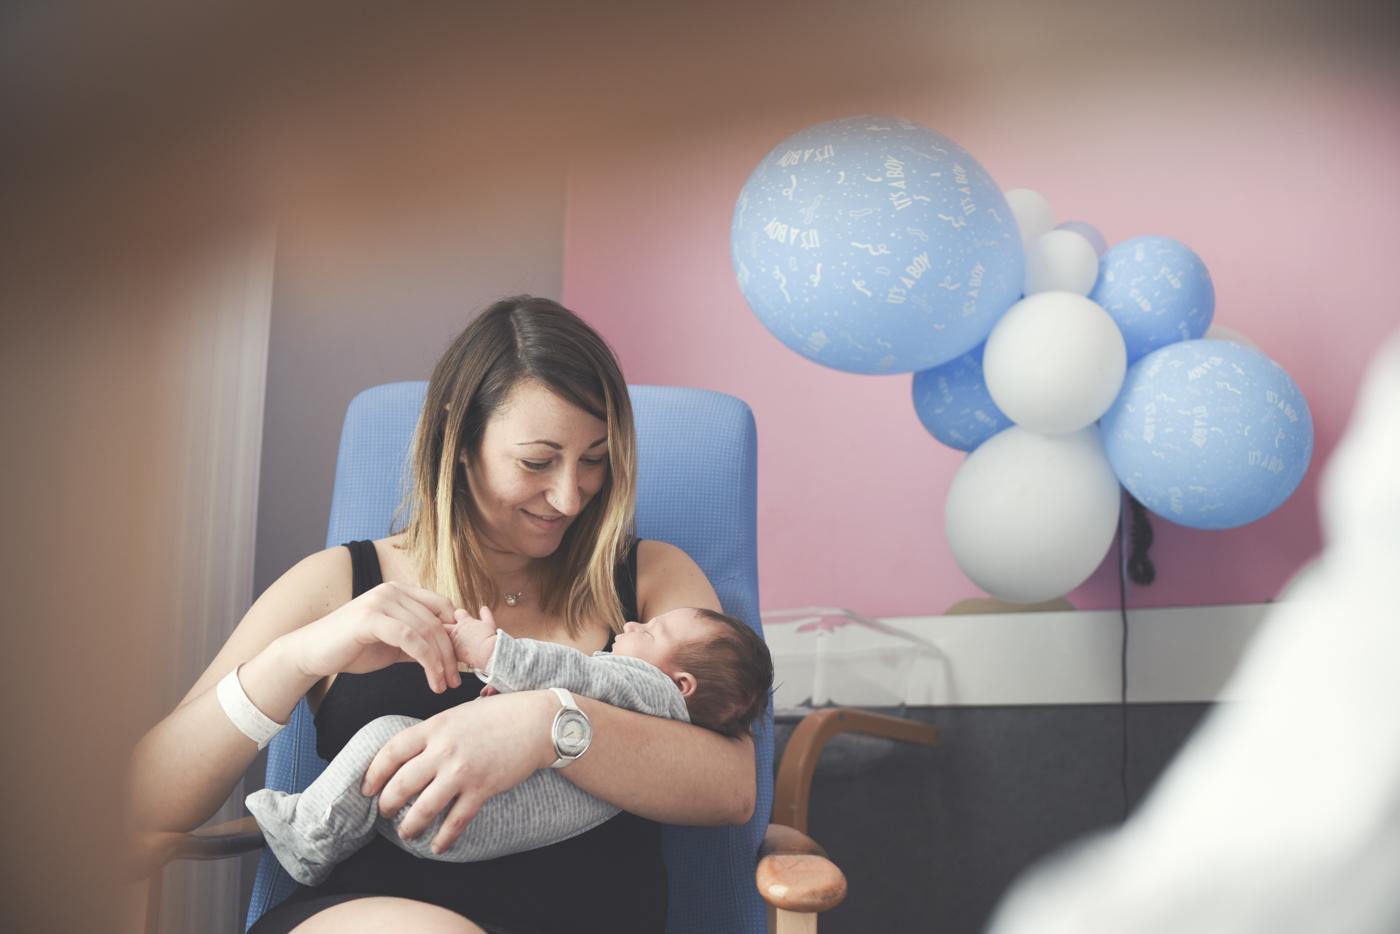 portfolio-fotos-bebes-recien-nacidos-ninos-mia-moments-hospitalbrugman-03.jpg